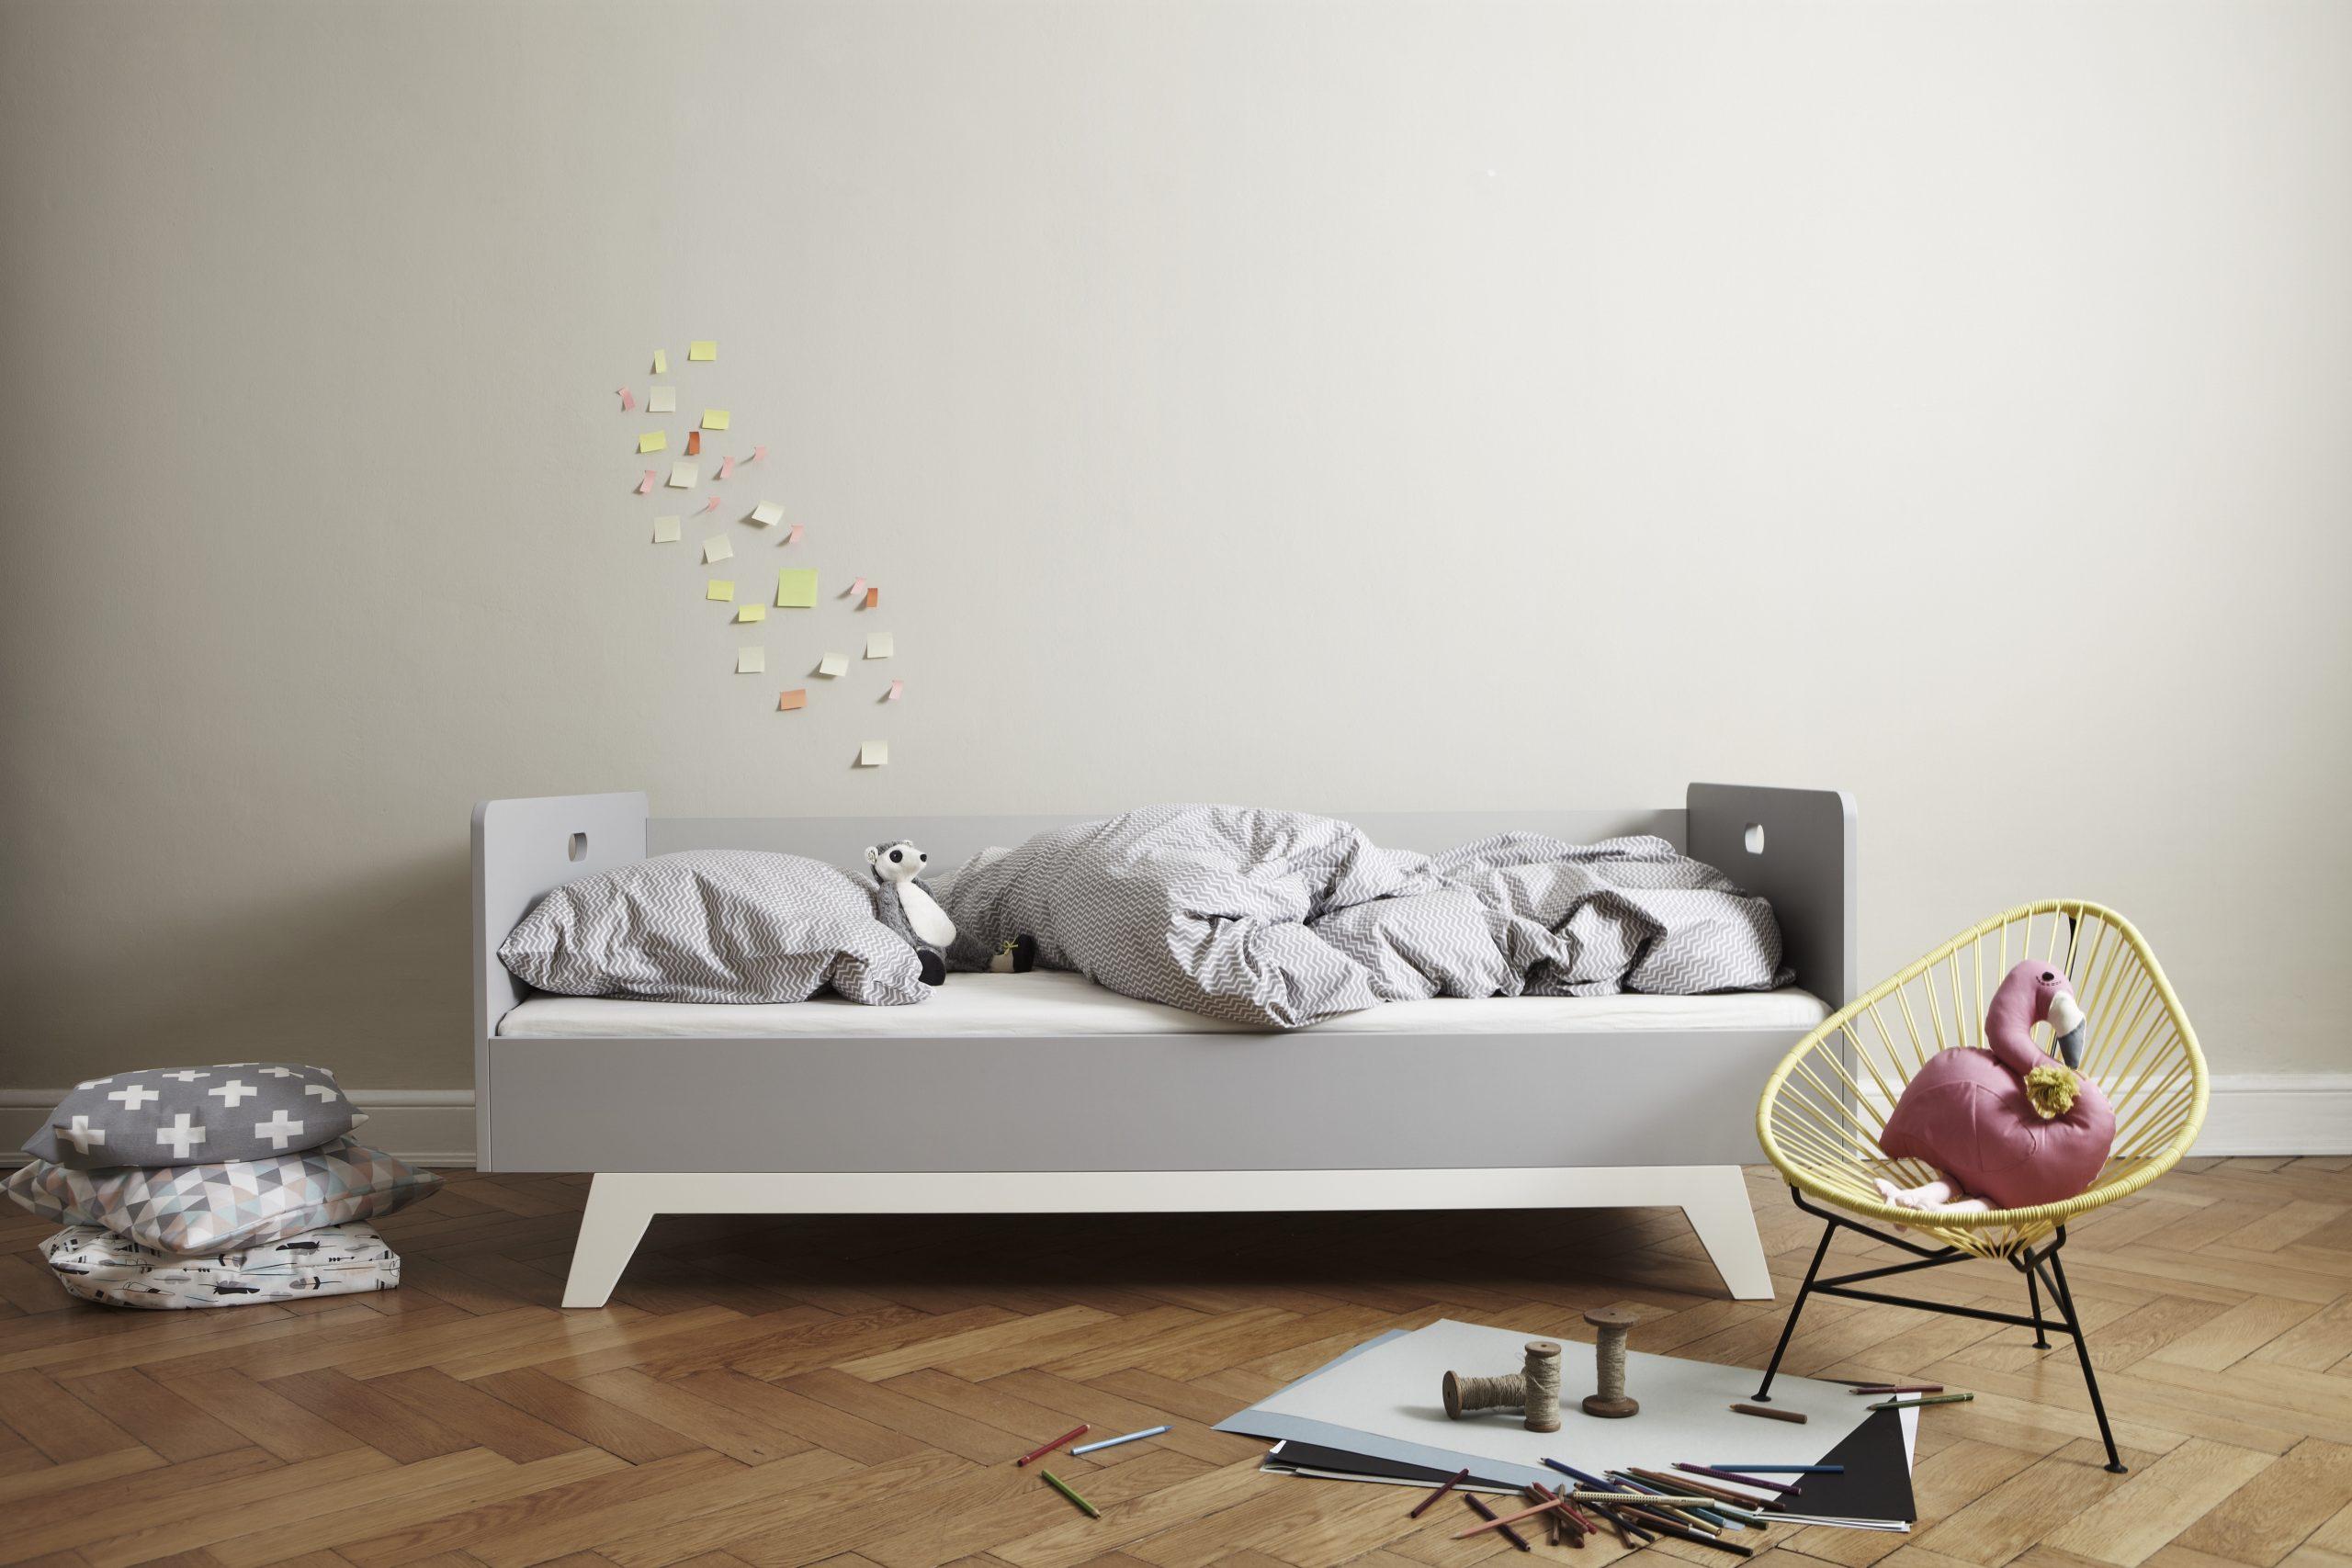 Full Size of Großes Bett Grosses Mimm Kindermbel Komplett Betten Bei Ikea 120x200 Weiß Zum Ausziehen 100x200 Balken Halbhohes Weißes 90x200 Wohnwert Stabiles 200x200 Bett Großes Bett